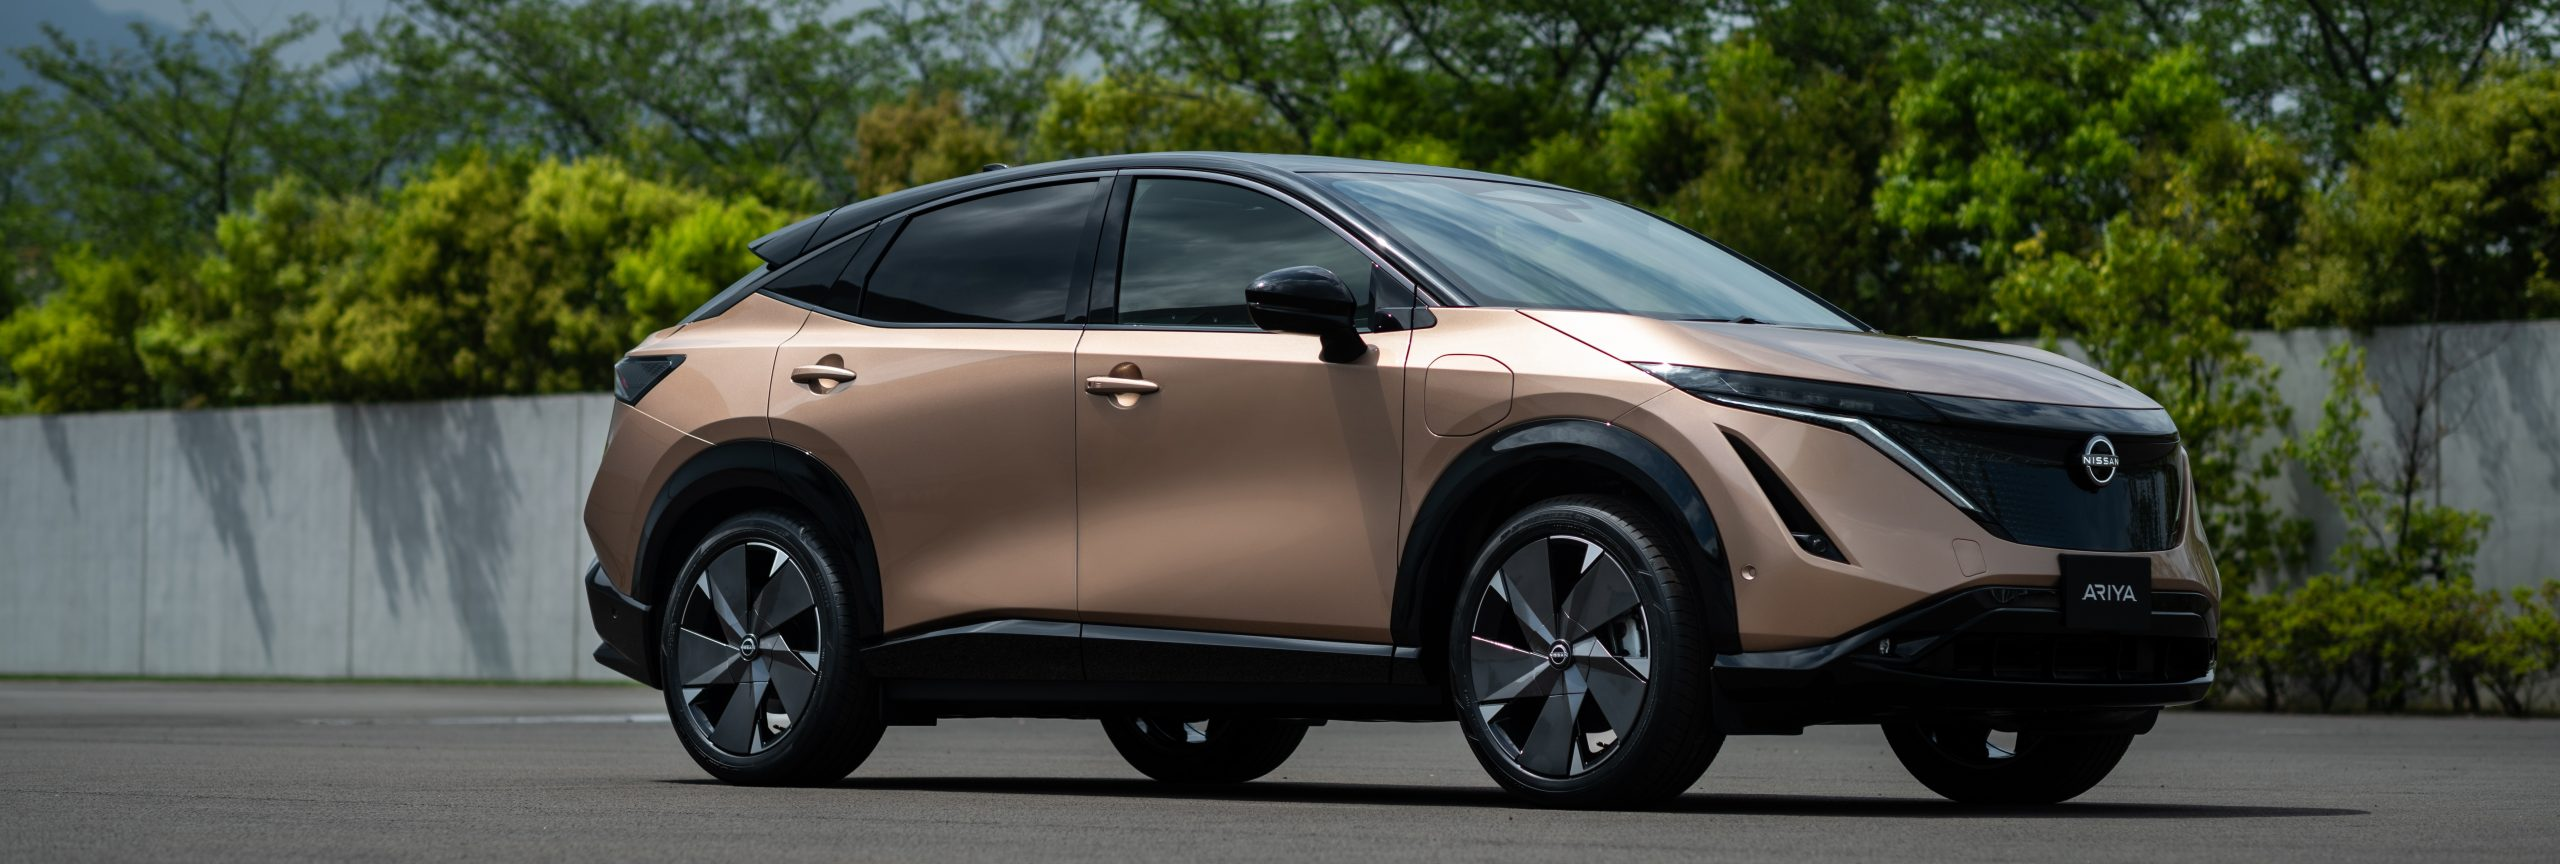 Nissan Ariya harlingen